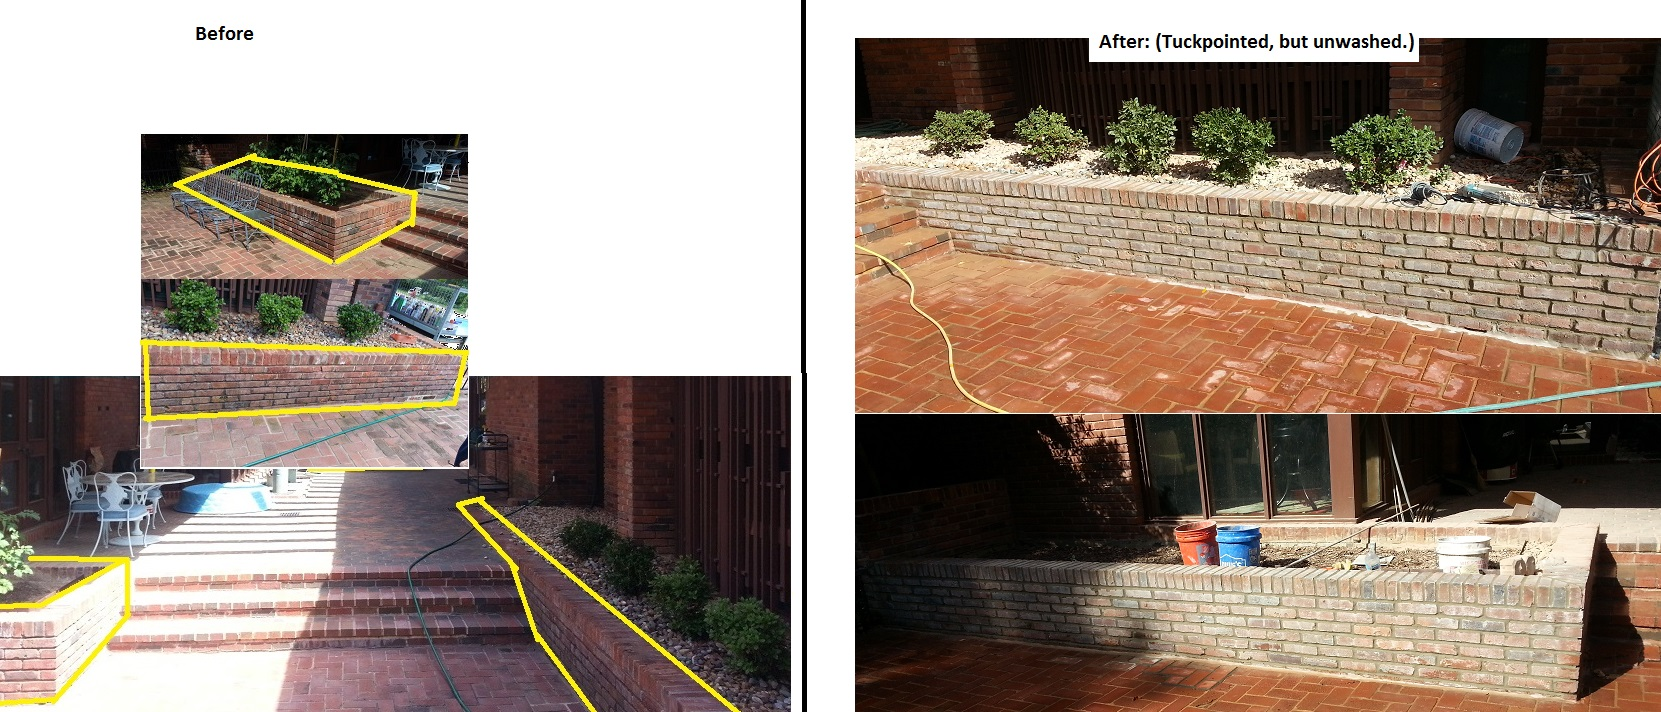 Easy Tuck Point Using a Masonry Grout Bag | Doovi |Tuck Point Mortar Retaining Wall